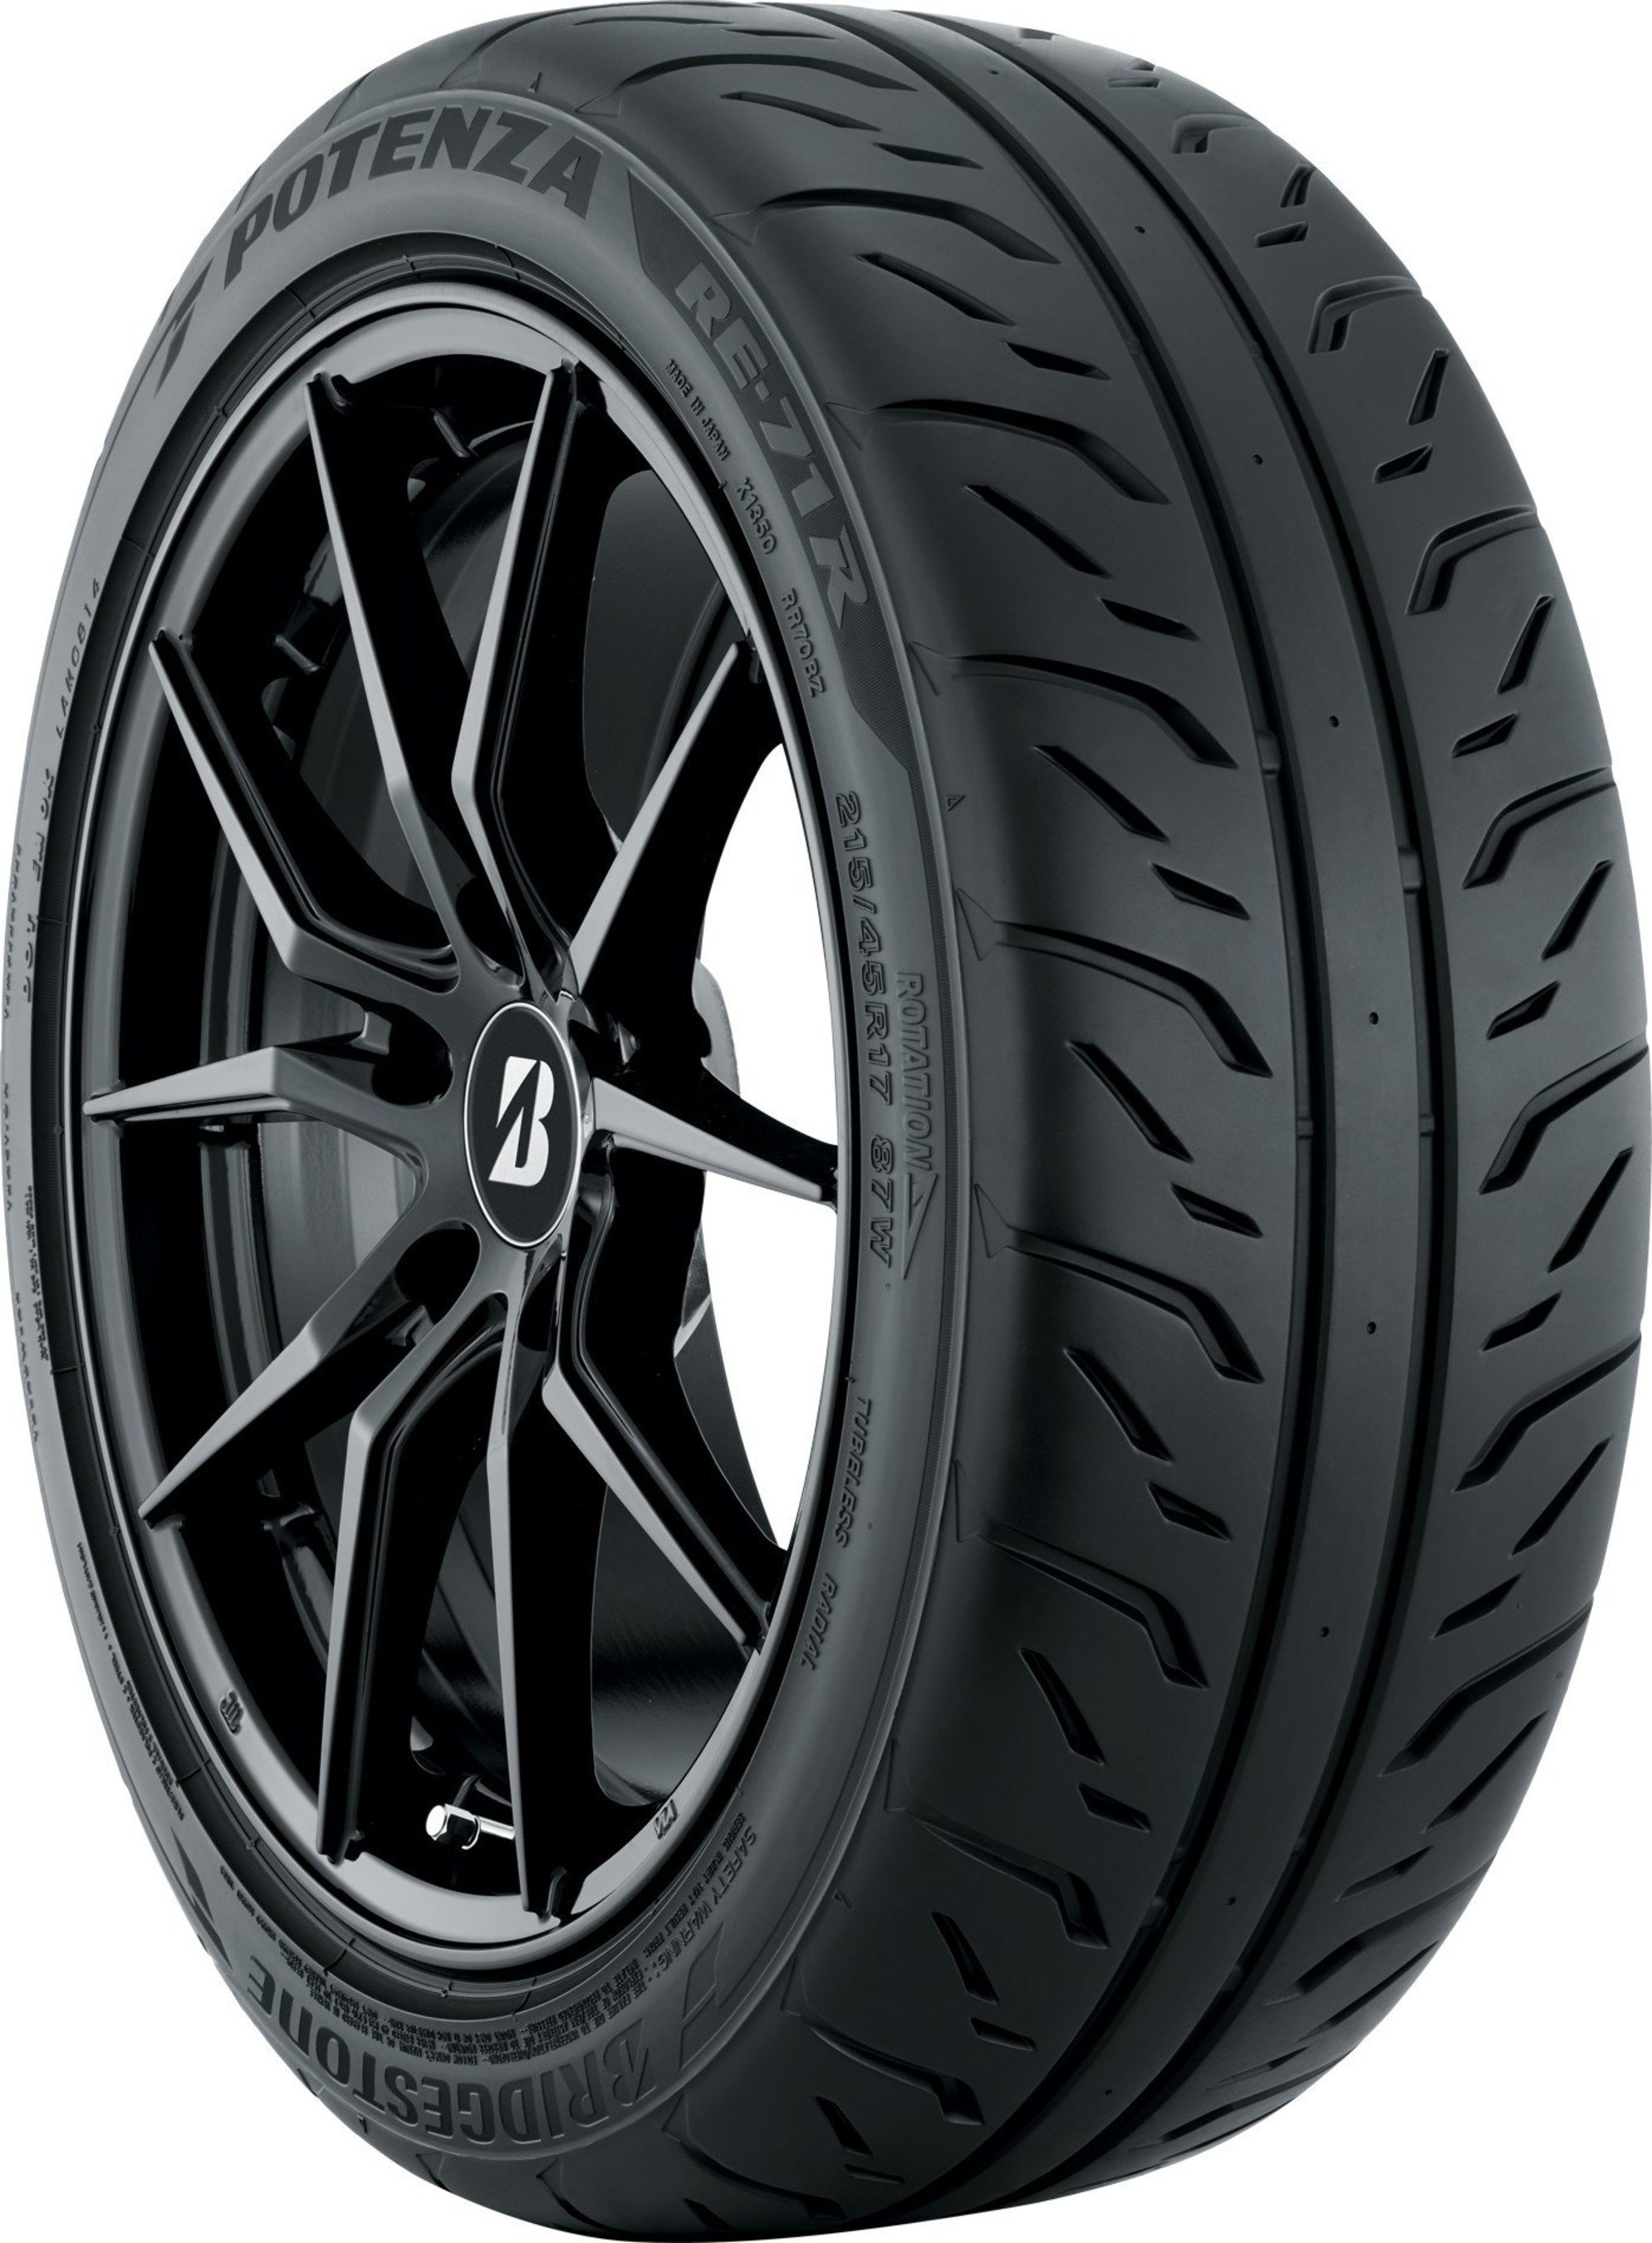 Are You Thinking Of Buying Performance Tyres Go The Bridgestone Way Performance Tyres Bridgestone Bridgestone Tires [ 2700 x 1989 Pixel ]